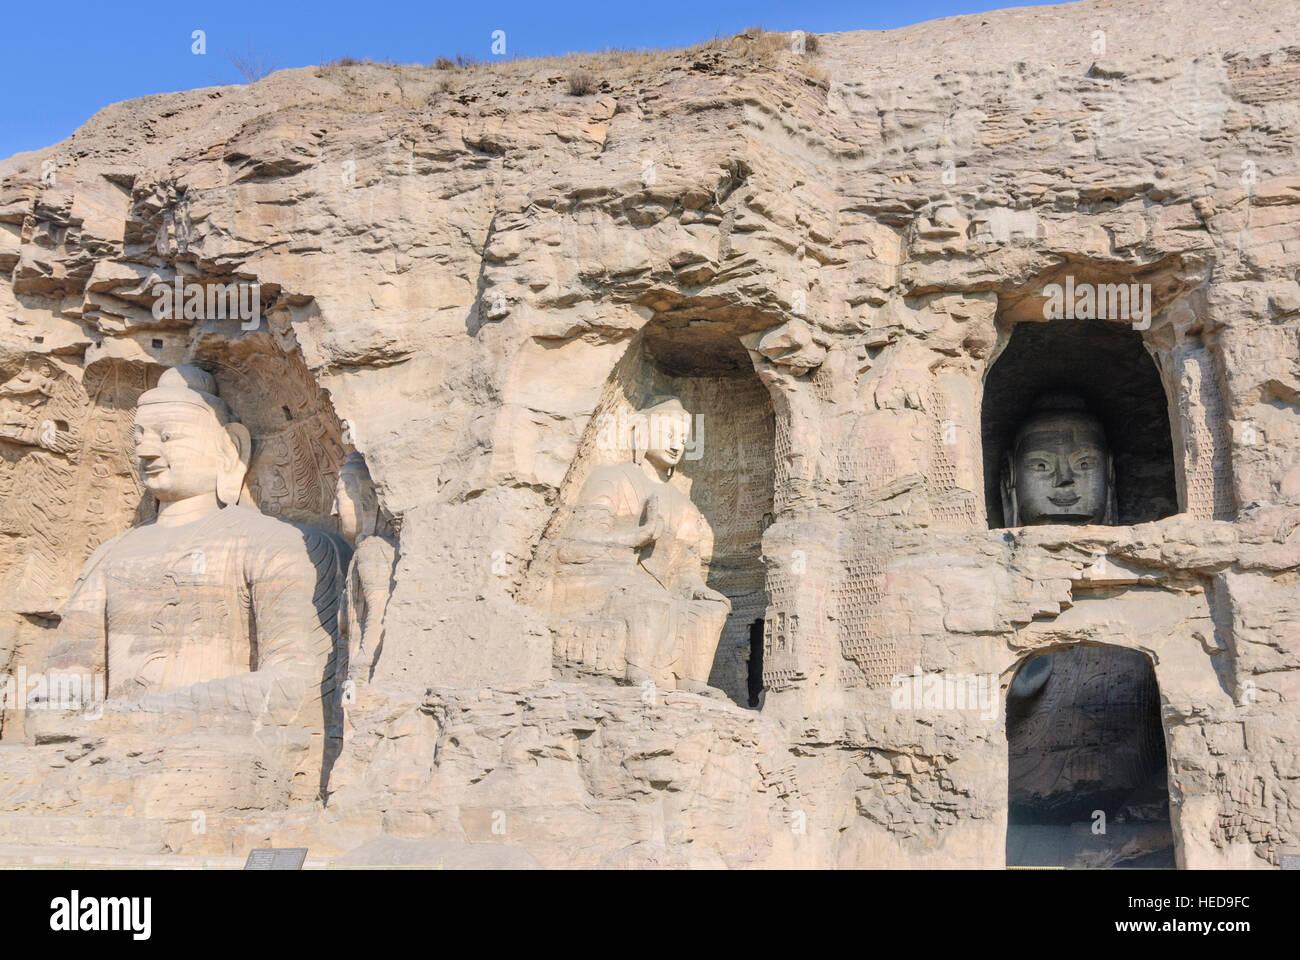 Datong: Yungang Caves; Cavities 19 and 20; 14m high sitting Sakyamuni Buddha (left) in cave 20, Shanxi, China - Stock Image